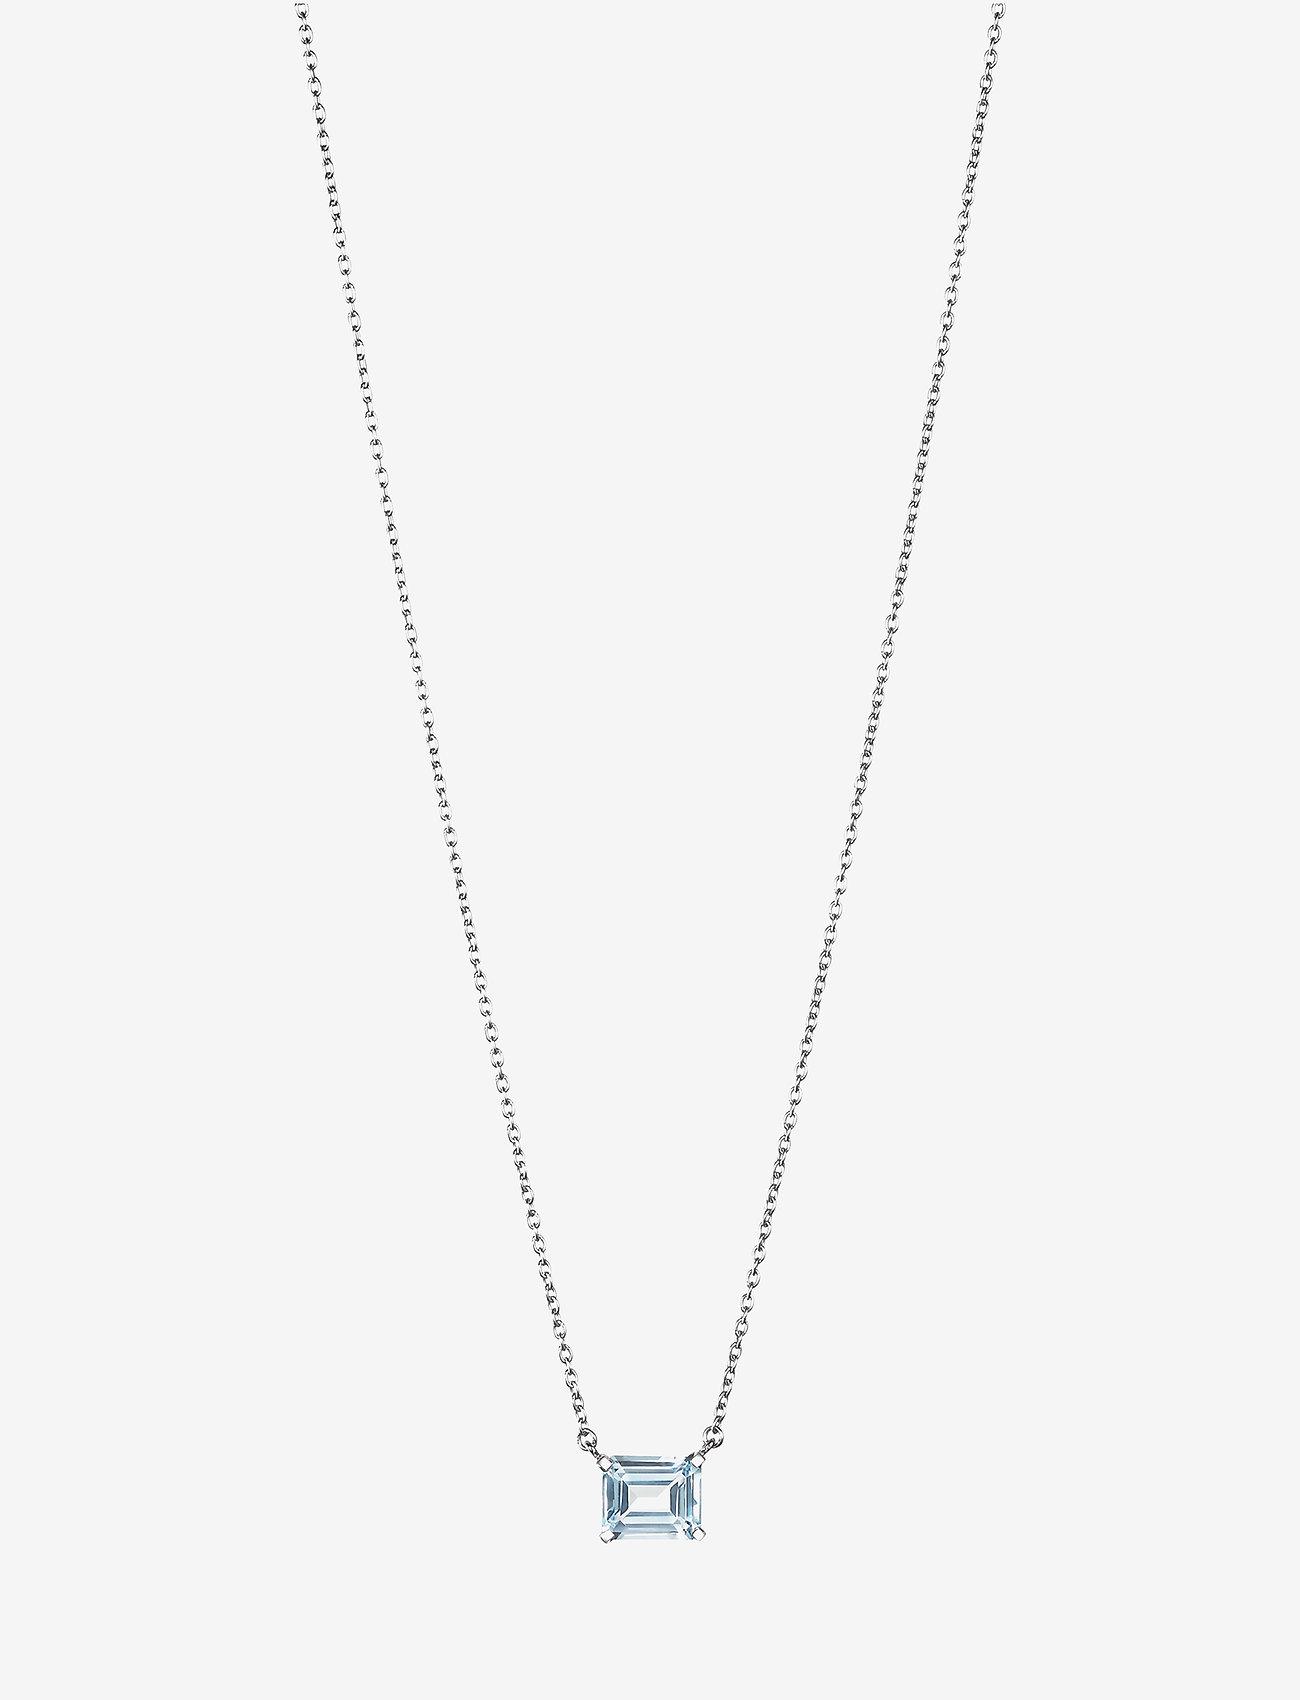 Efva Attling - A Macaron Dream Necklace - kettingen met hanger - silver - 1